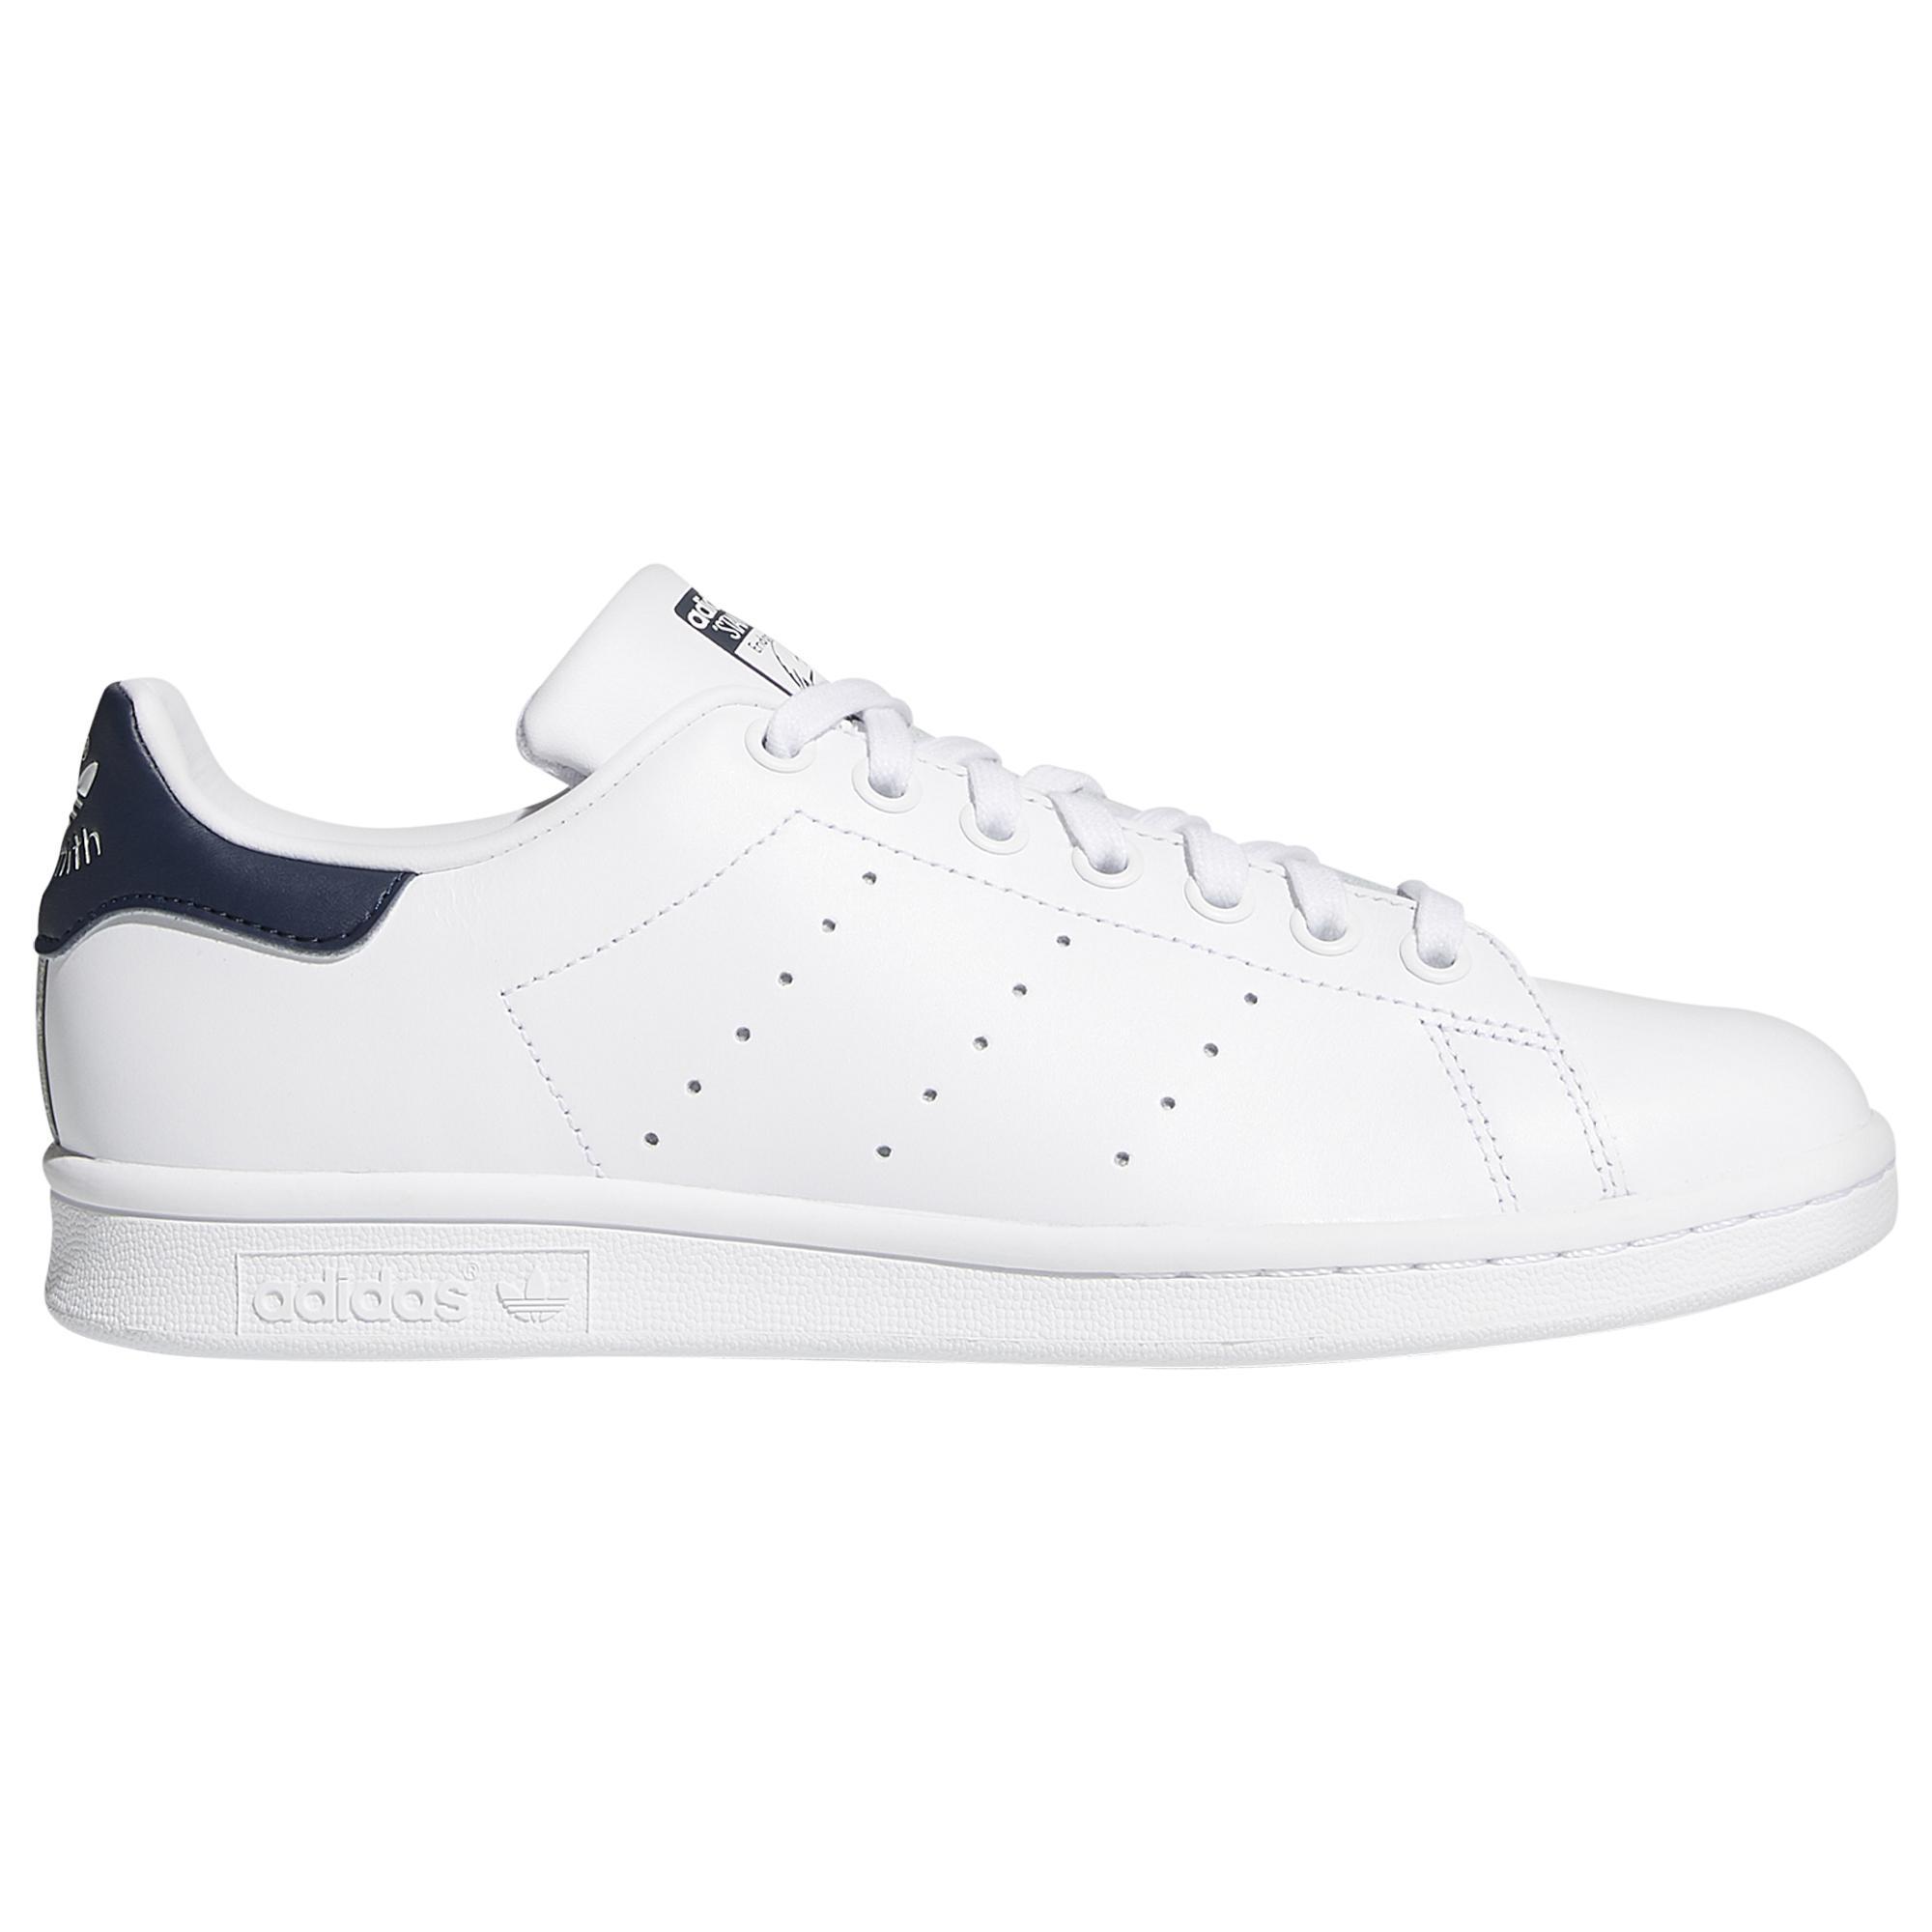 adidas Originals Stan Smith Sneaker in